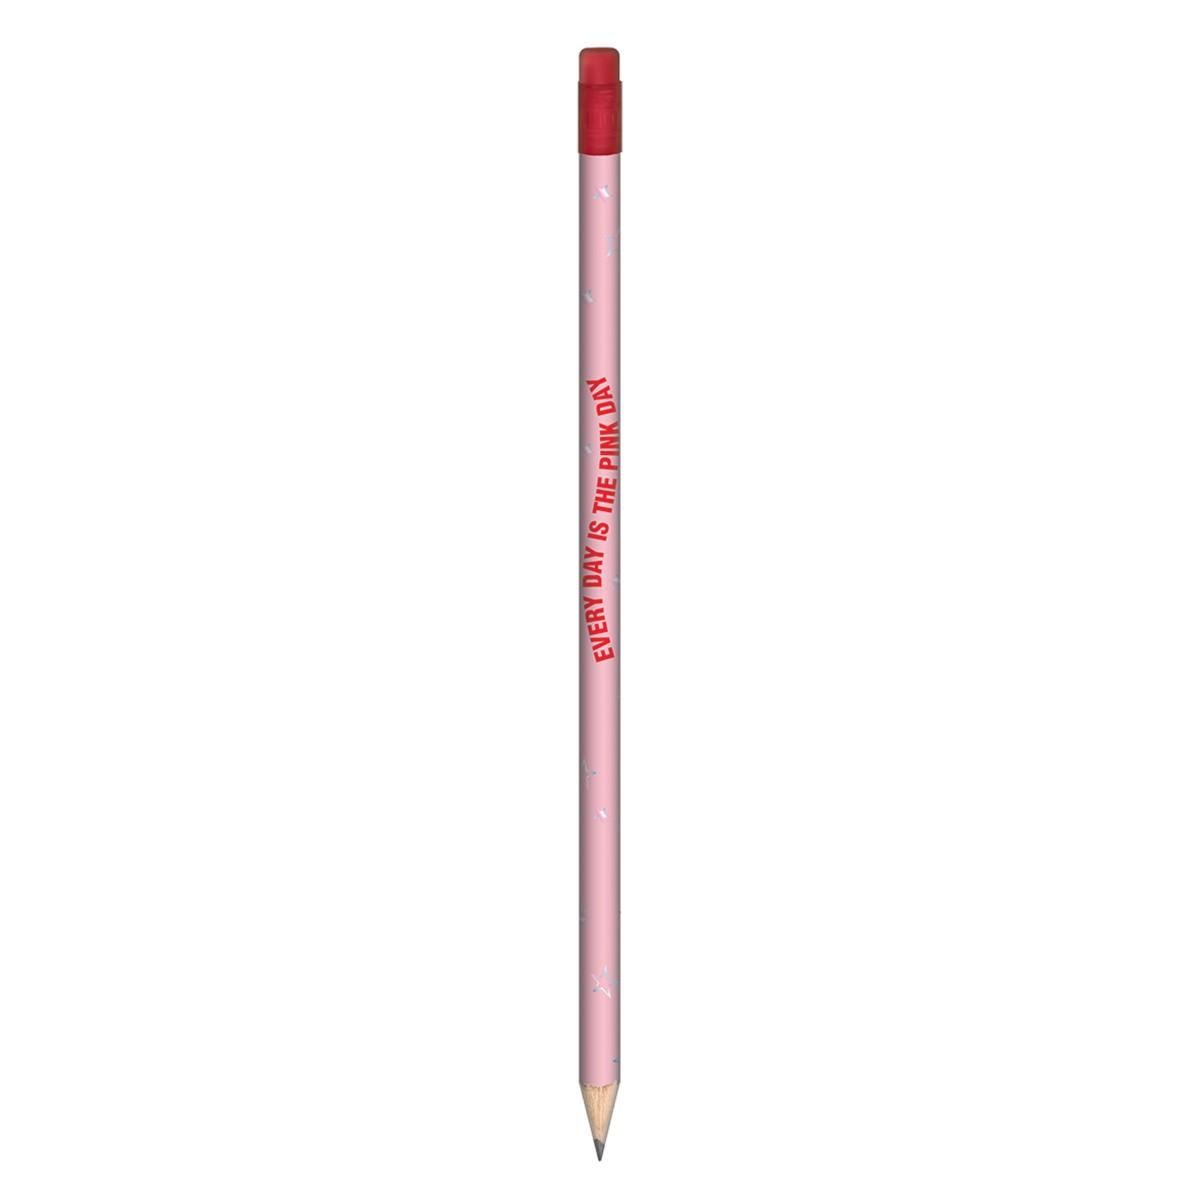 Lápis de escrever Tilibra Love Pink